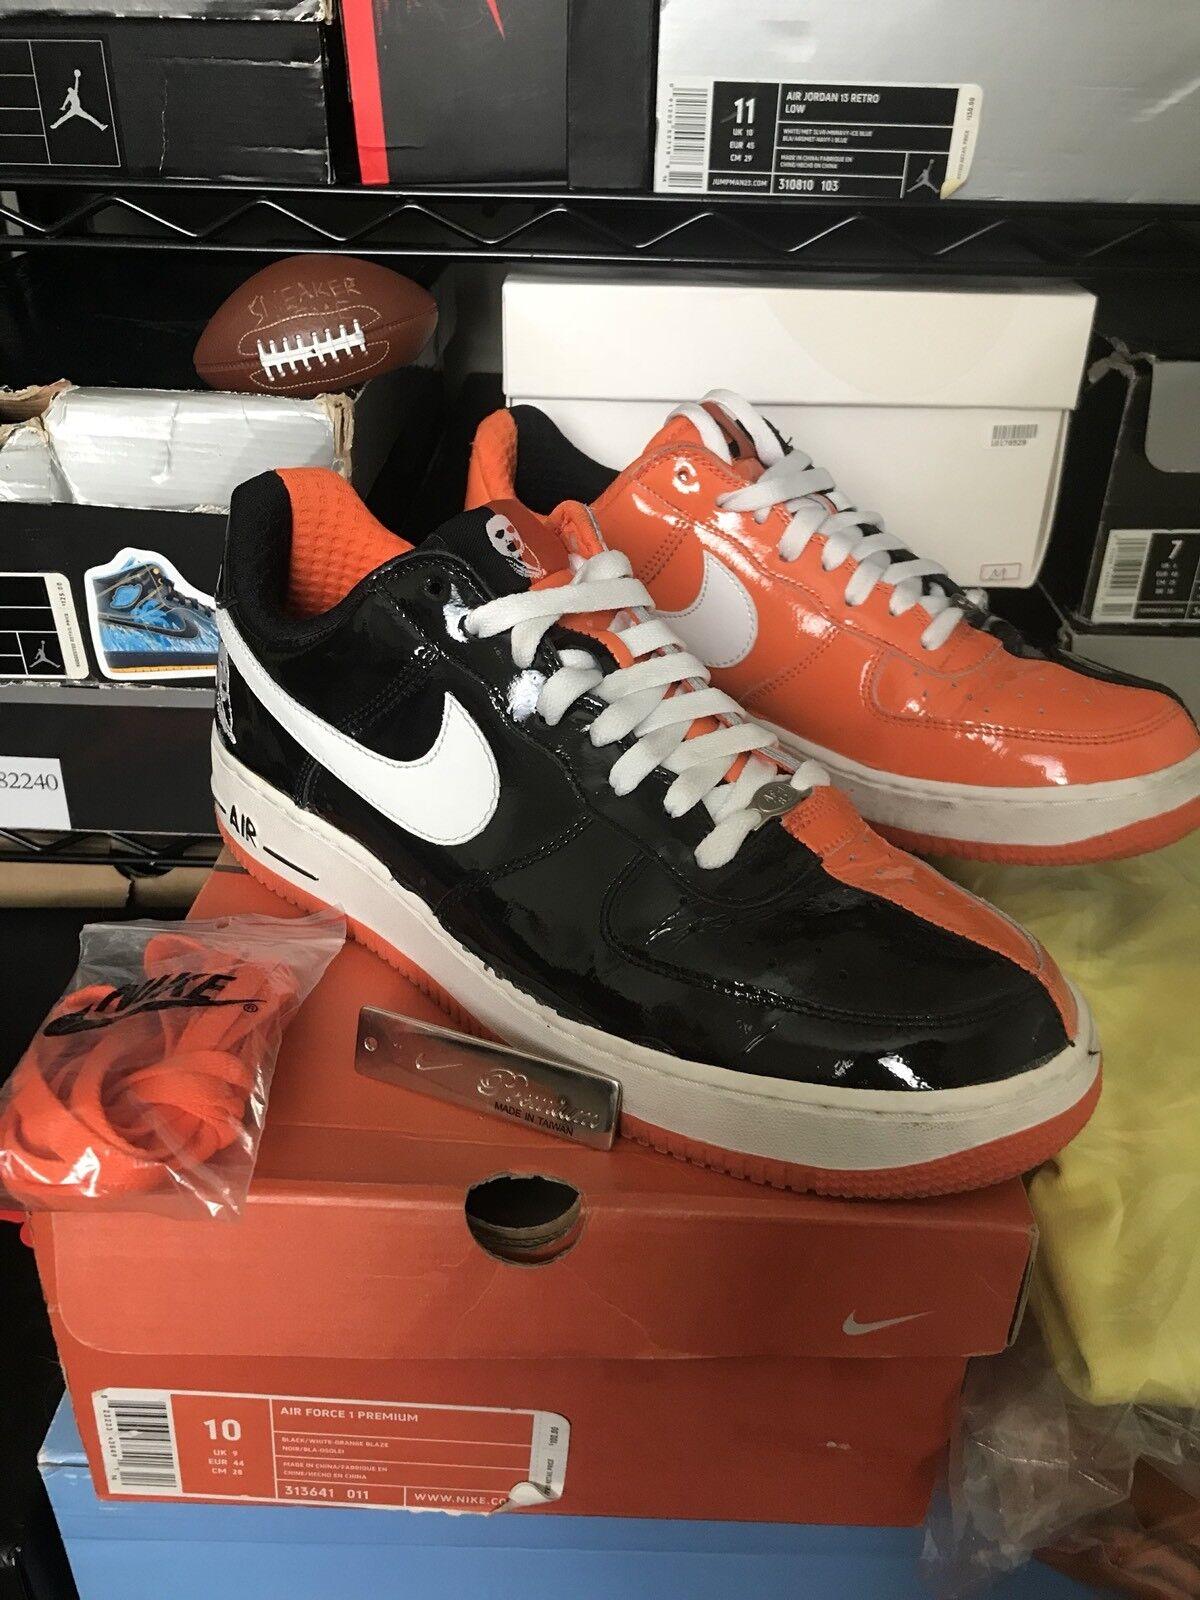 2018 Nike Air Force 1 Premium HALLOWEEN BLACK ORANGE WHITE 313641-011 Size 10